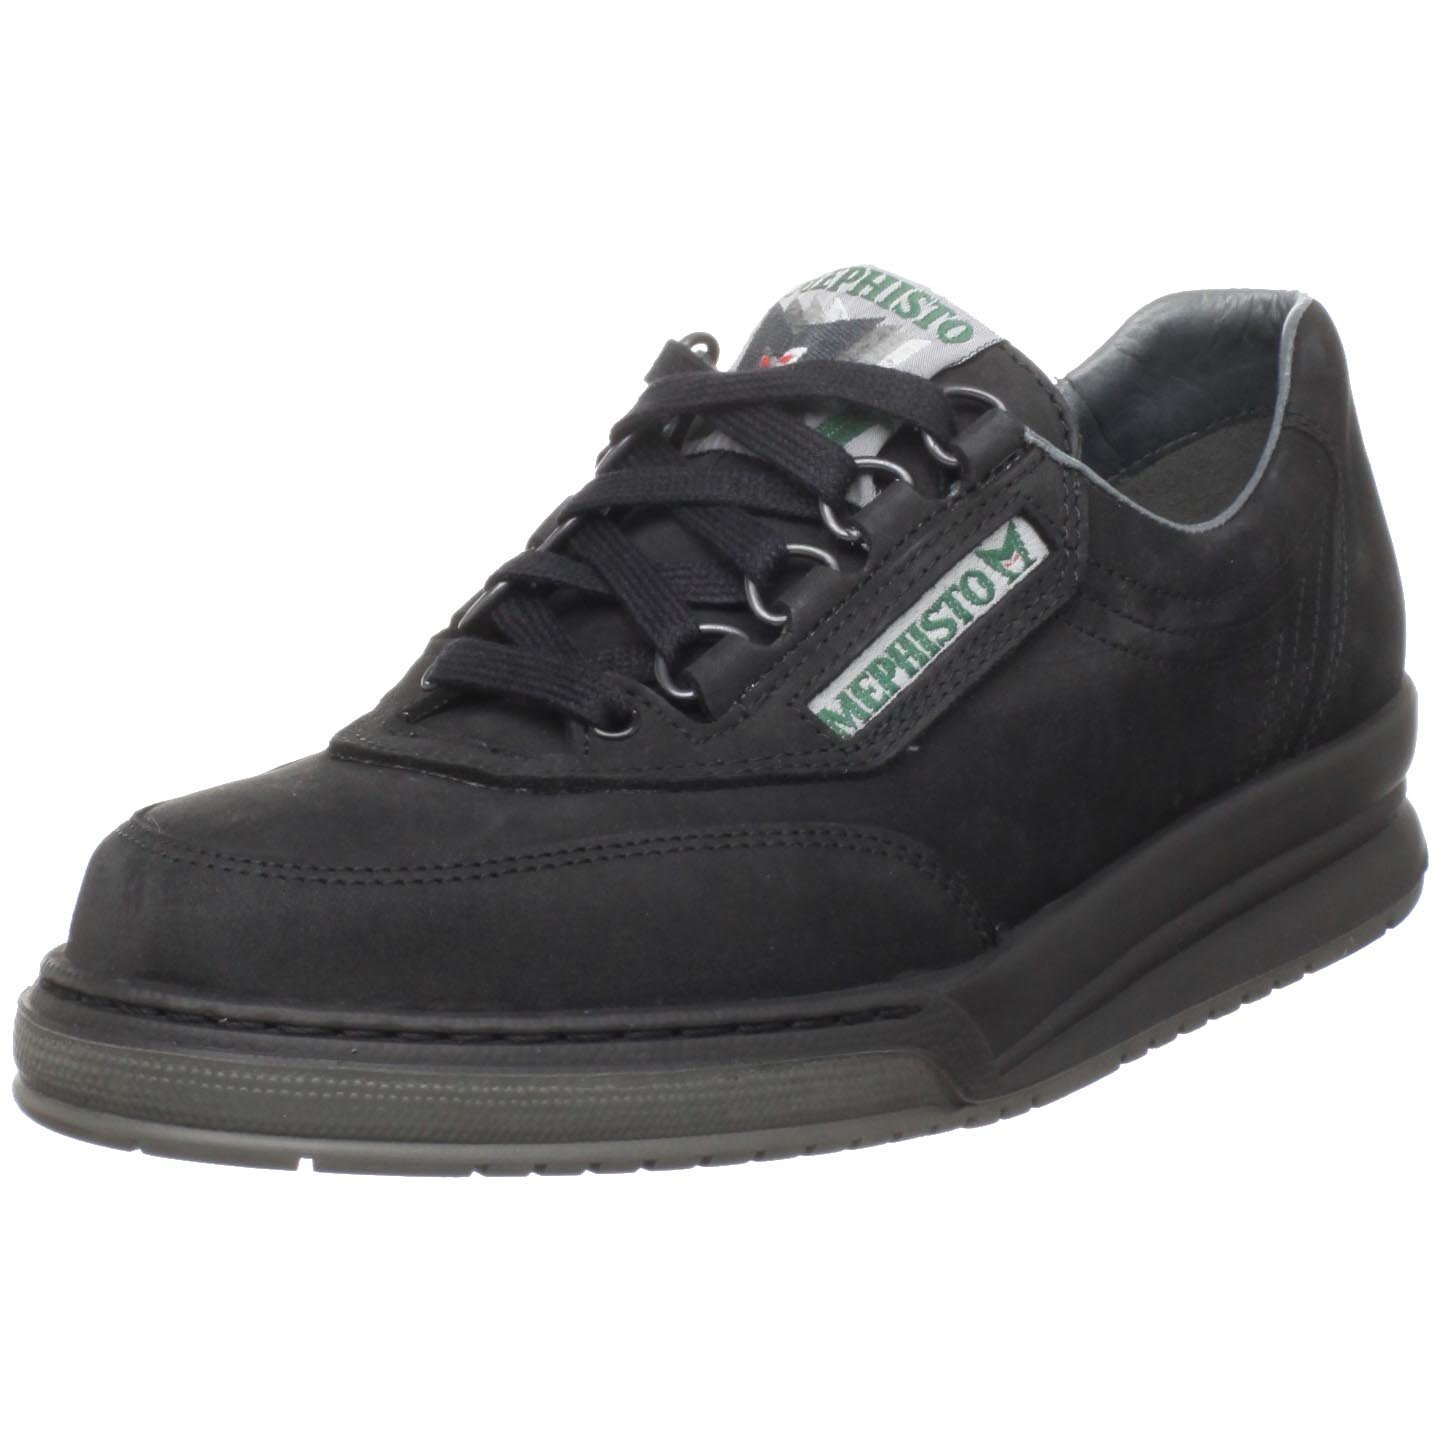 mephisto mephisto womens rushn walking shoe in black